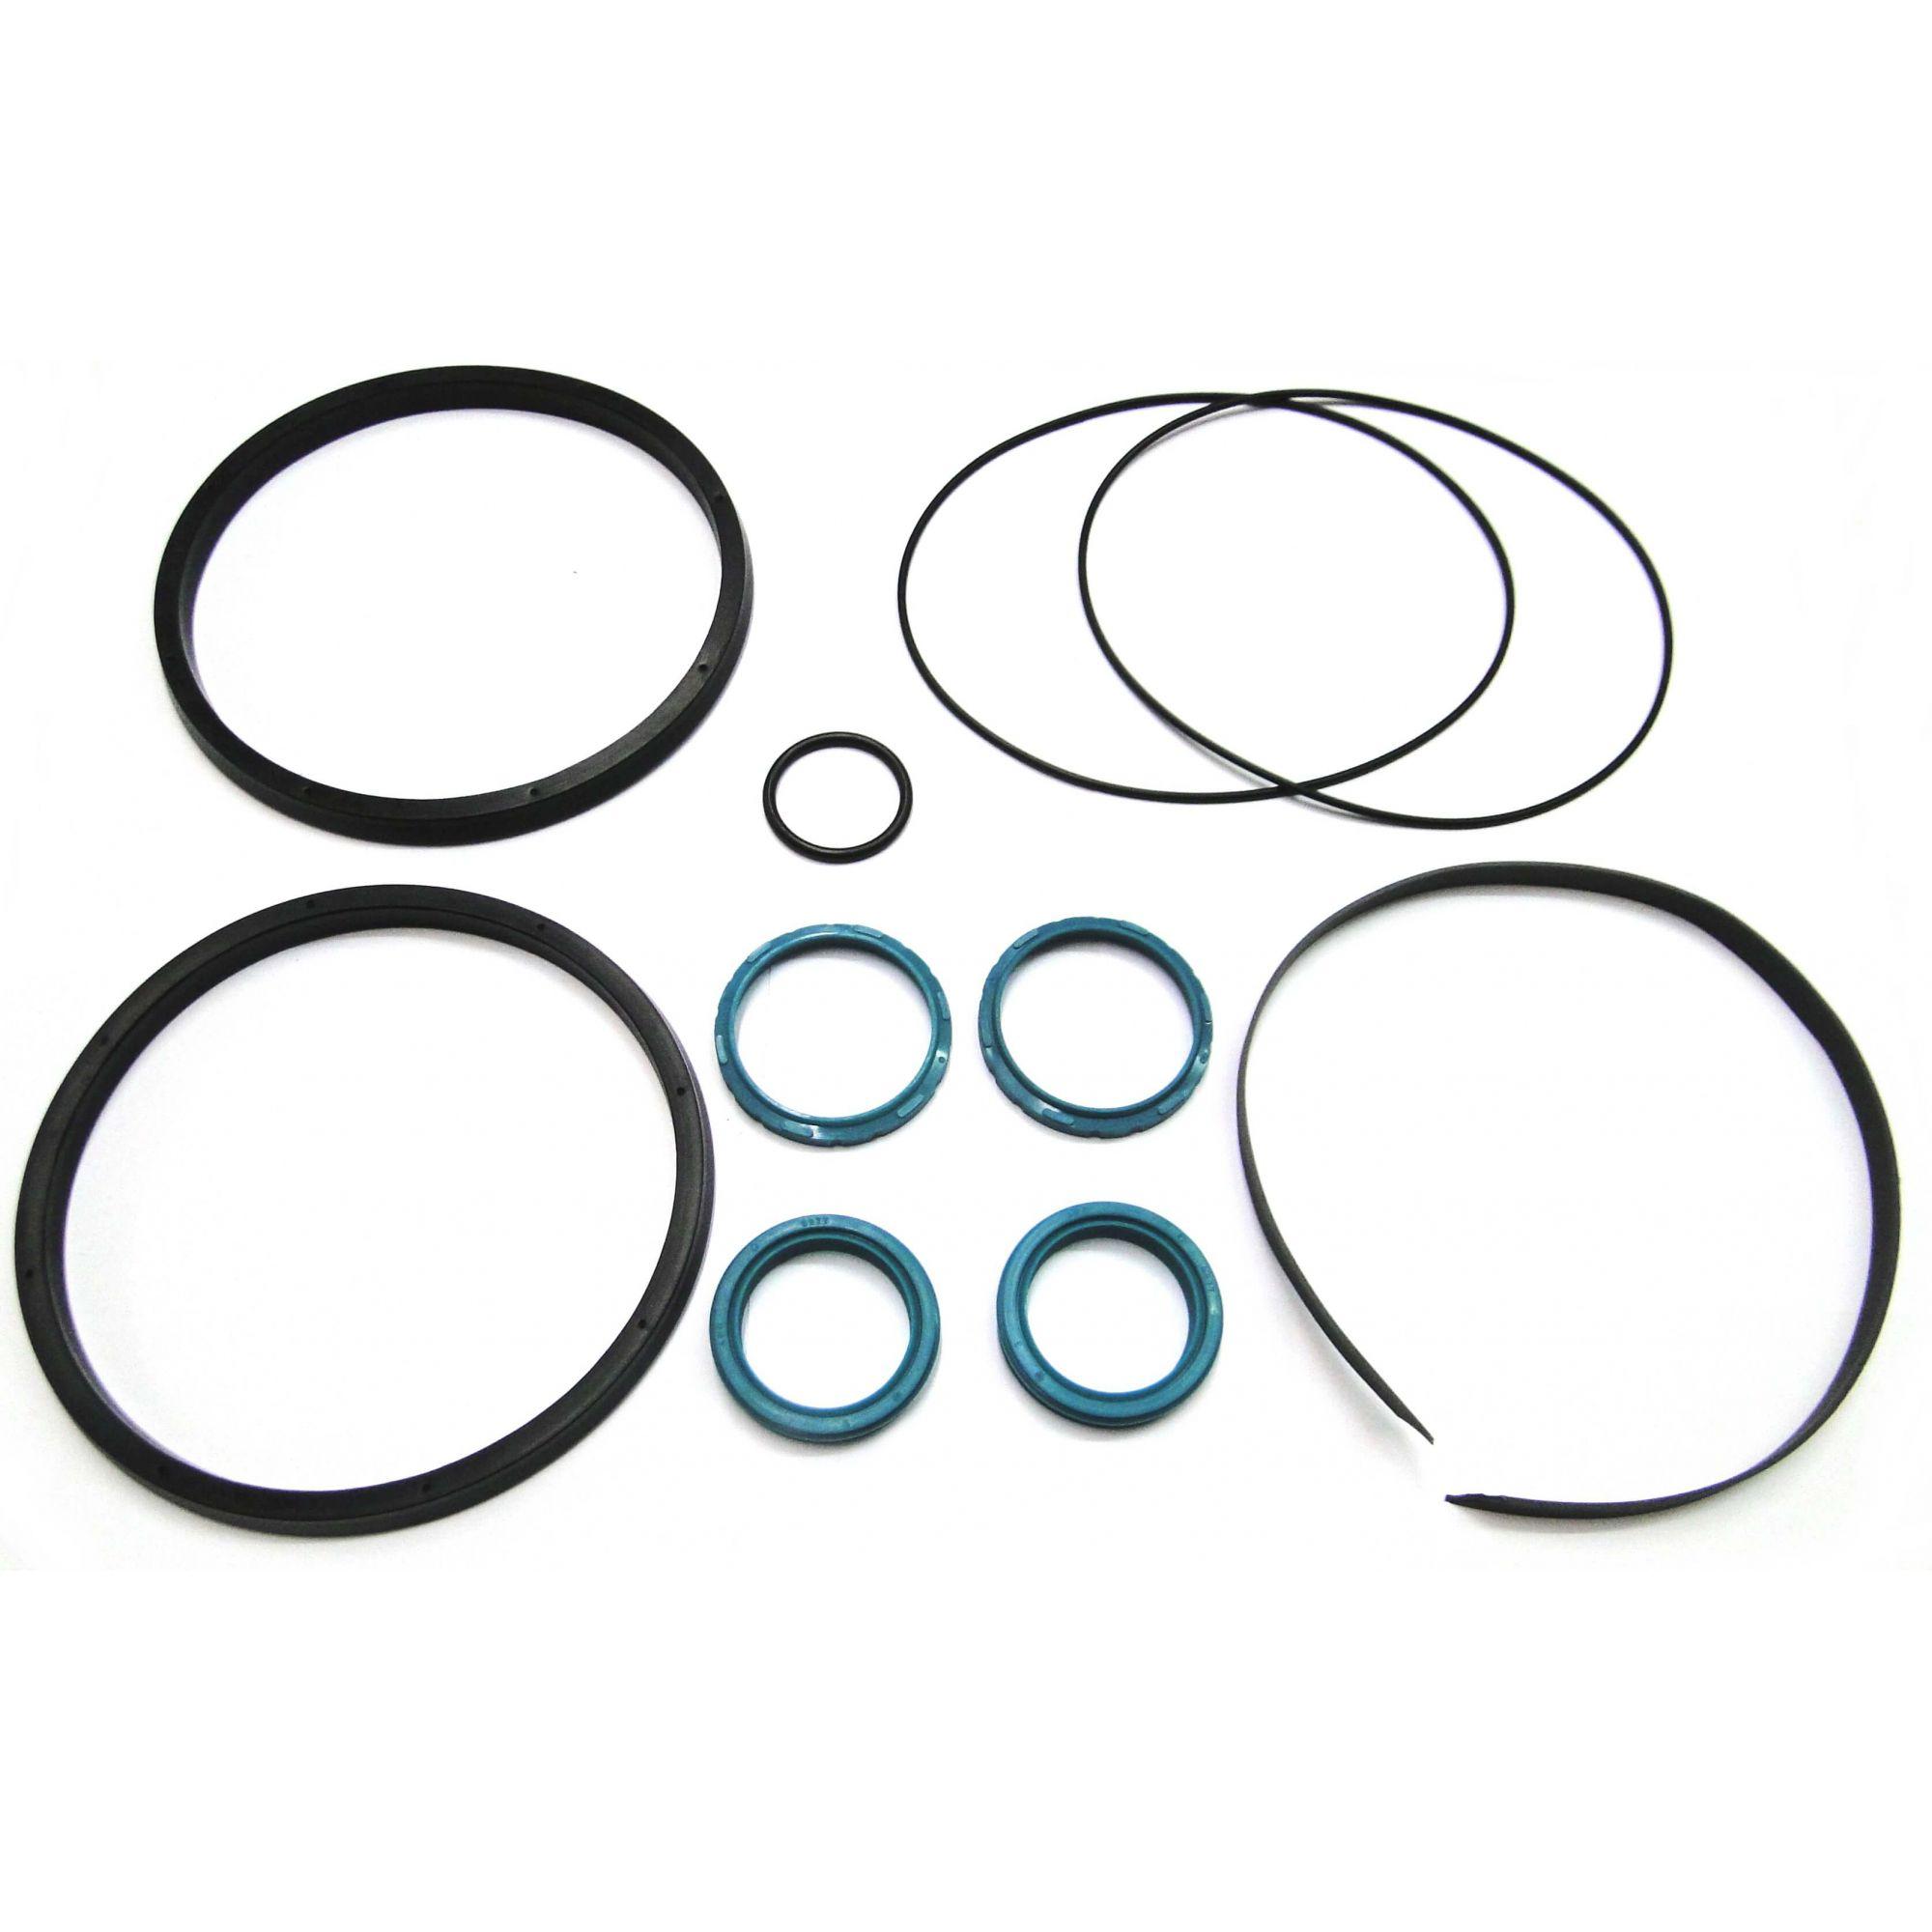 Kit Reparo para Cilindro Pneumático Haste Dupla E160 Werk Schott